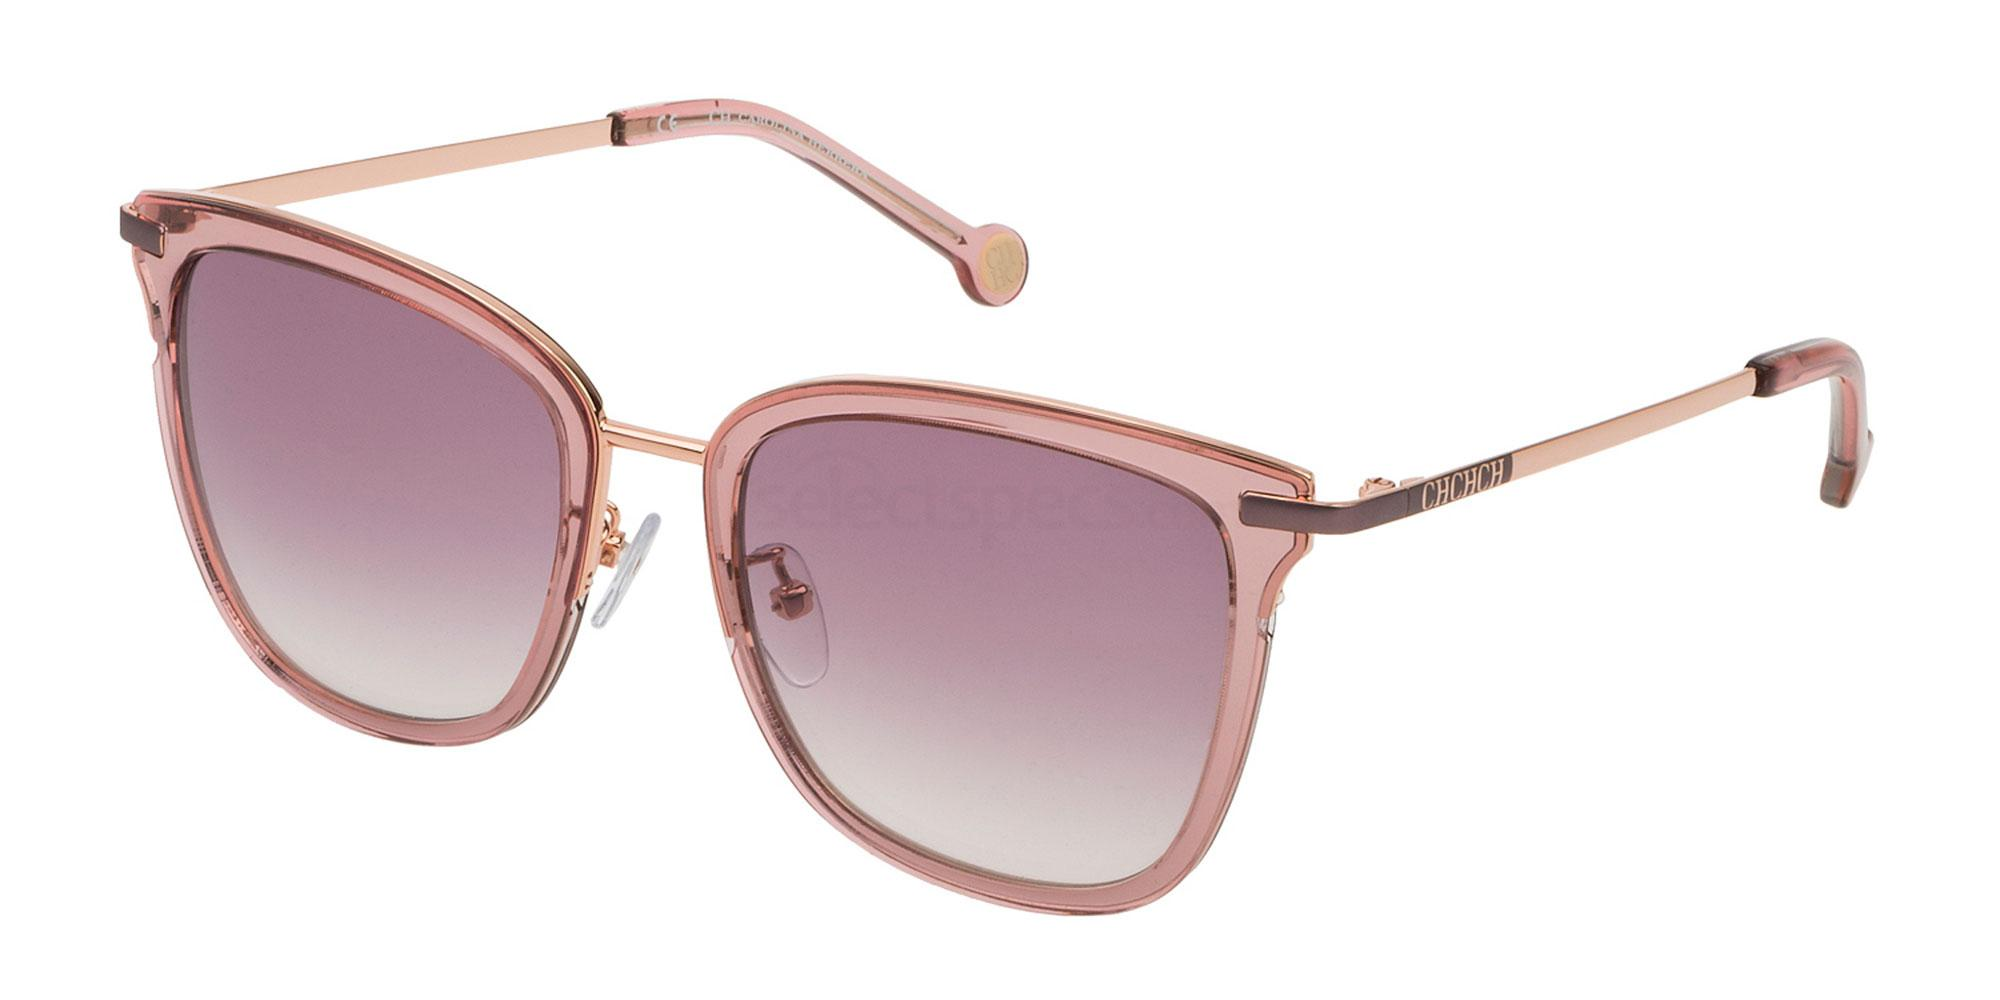 0561 SHE122 Sunglasses, CH Carolina Herrera